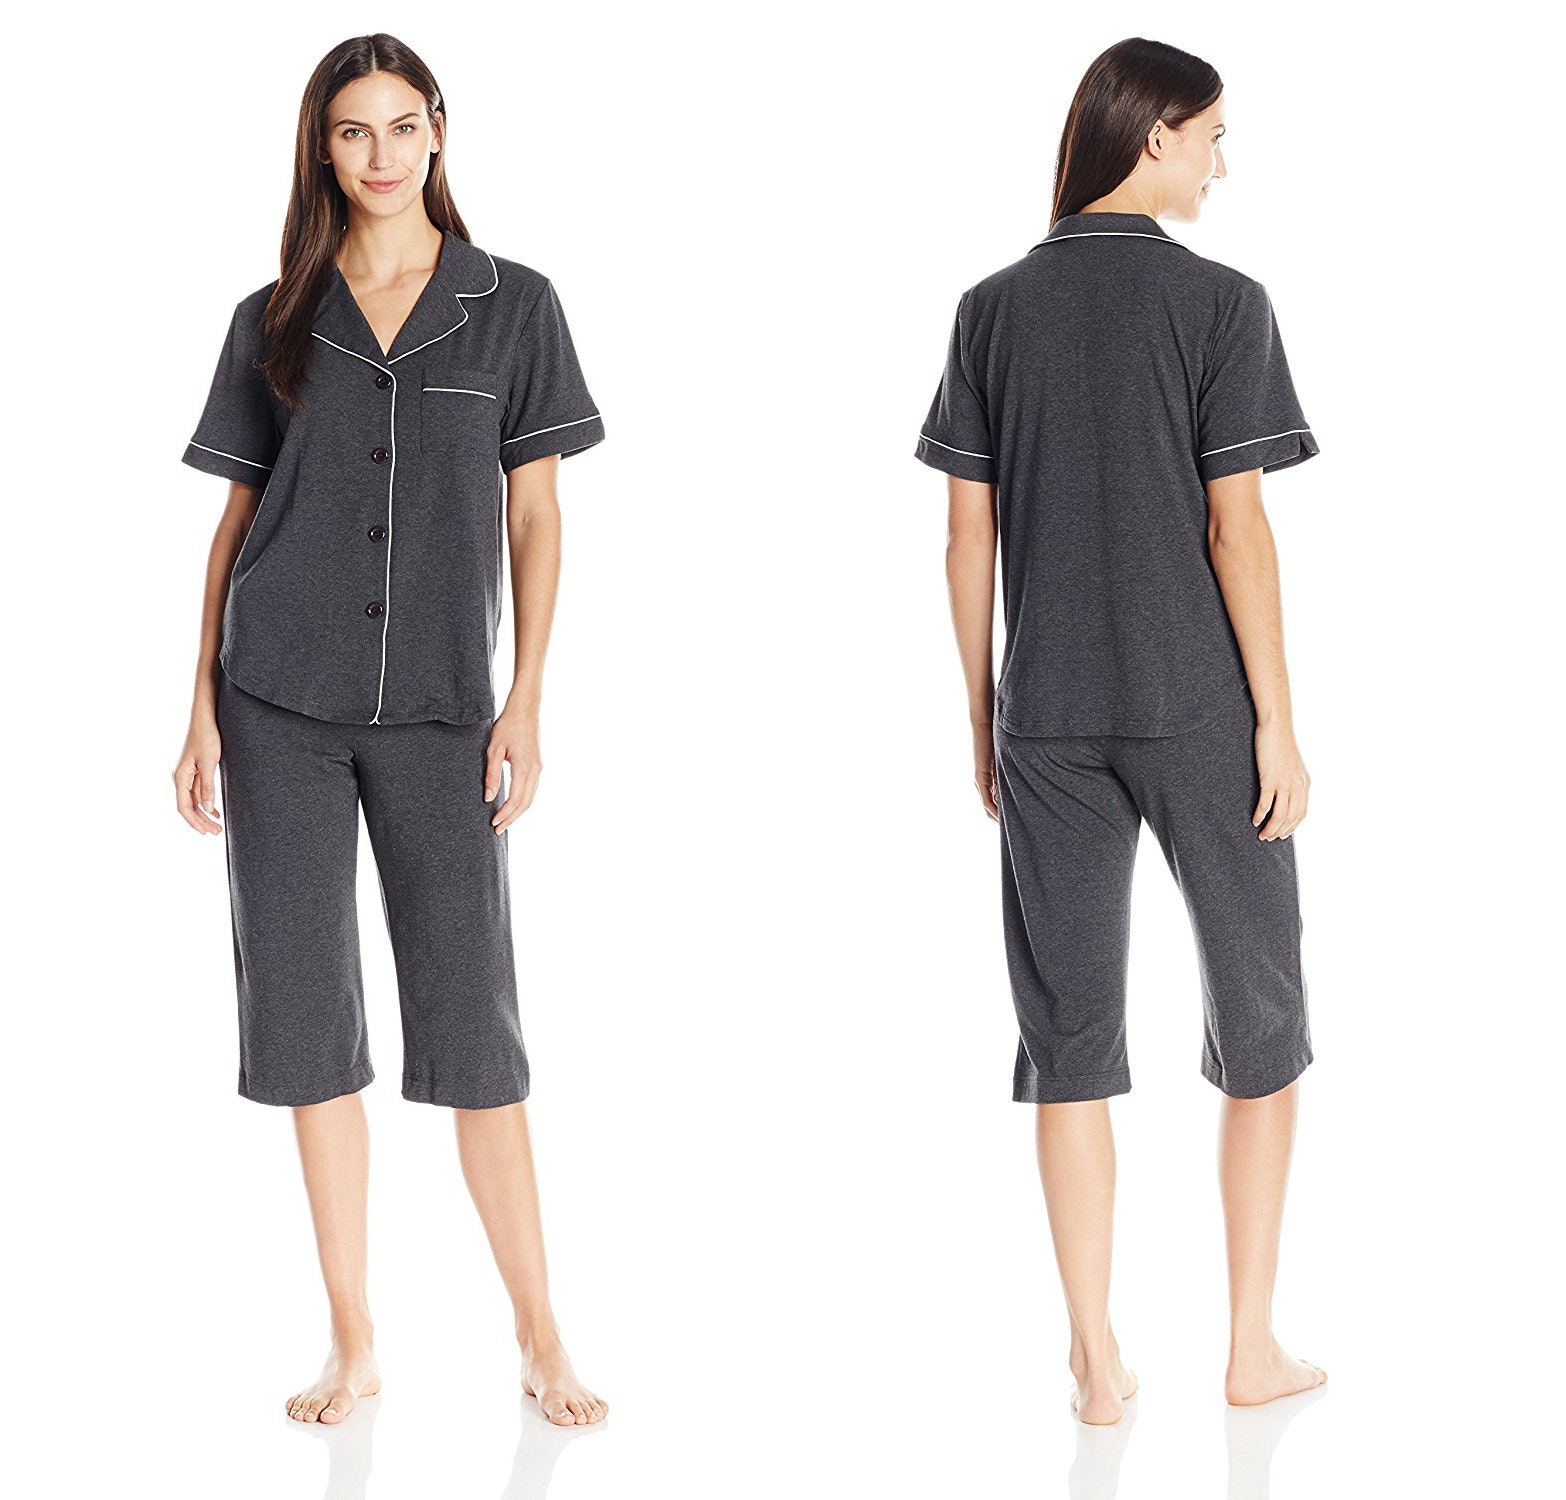 ladies bottoms acetshirt pajamas comfortable fpwsggg womens fleece pyjamas comforter and pants amp sleepwear stylish